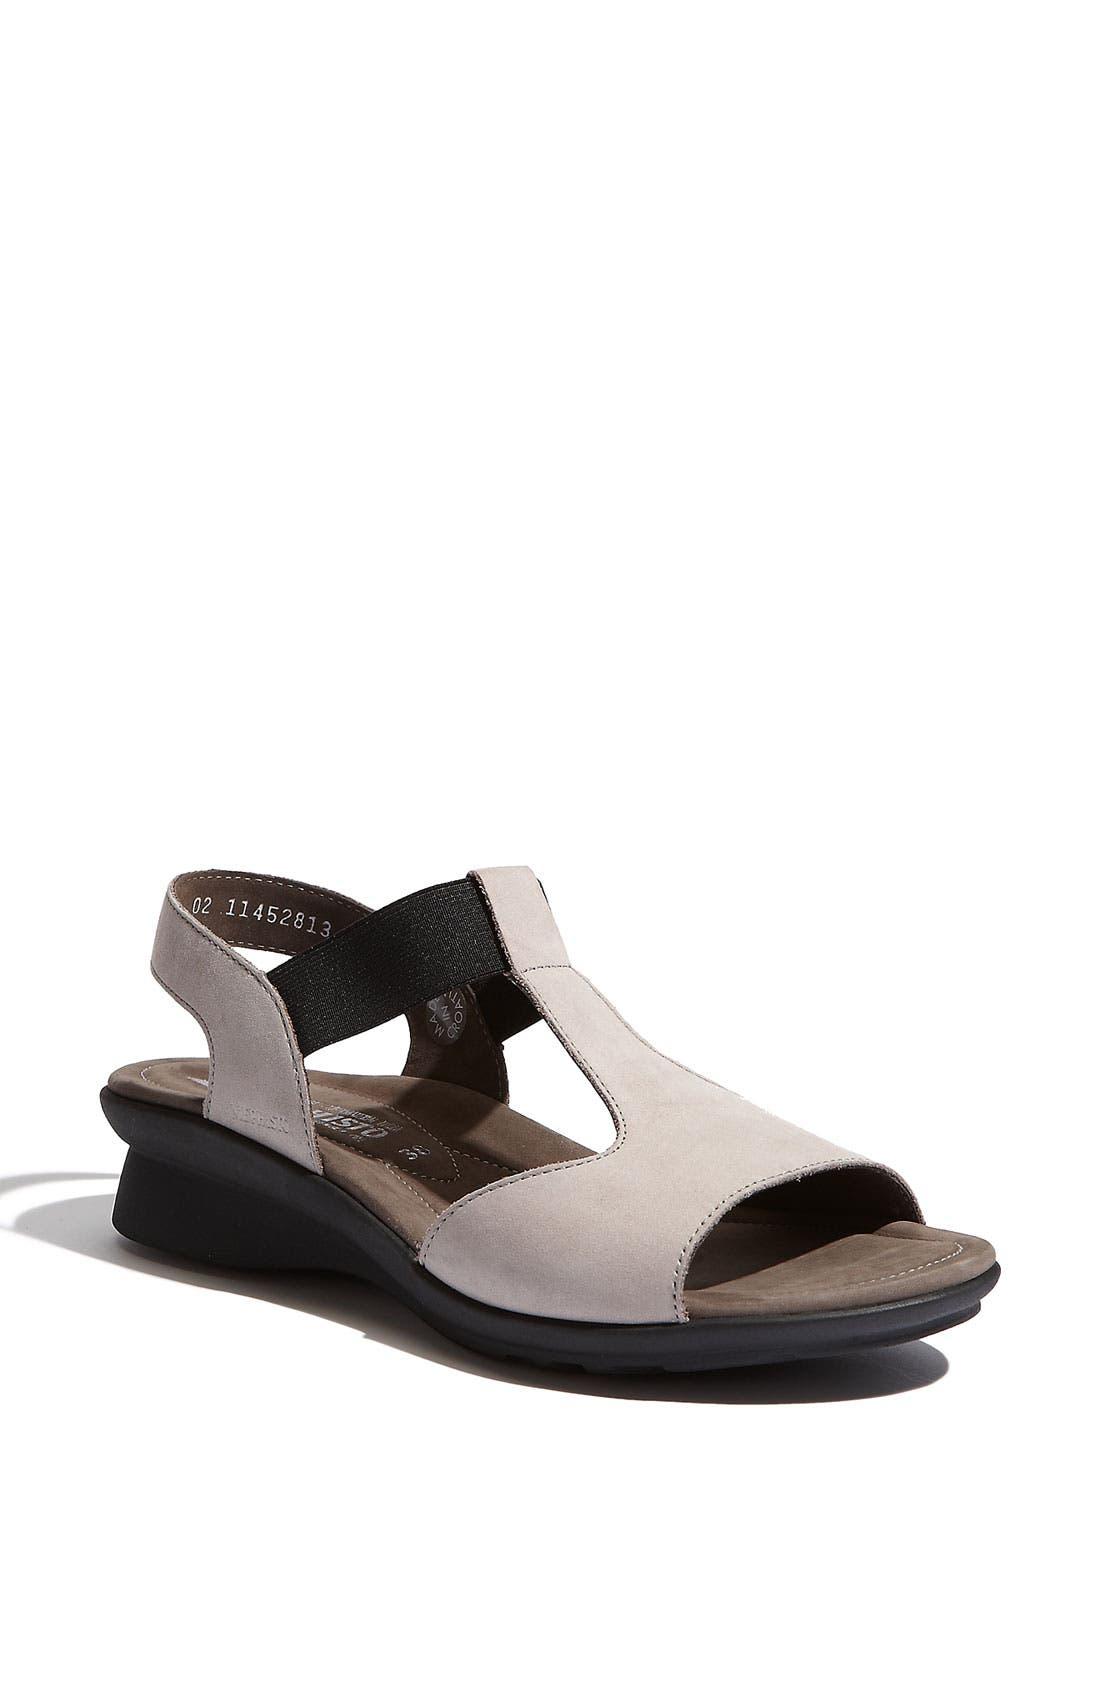 Alternate Image 1 Selected - Mephisto 'Petrea' Sandal